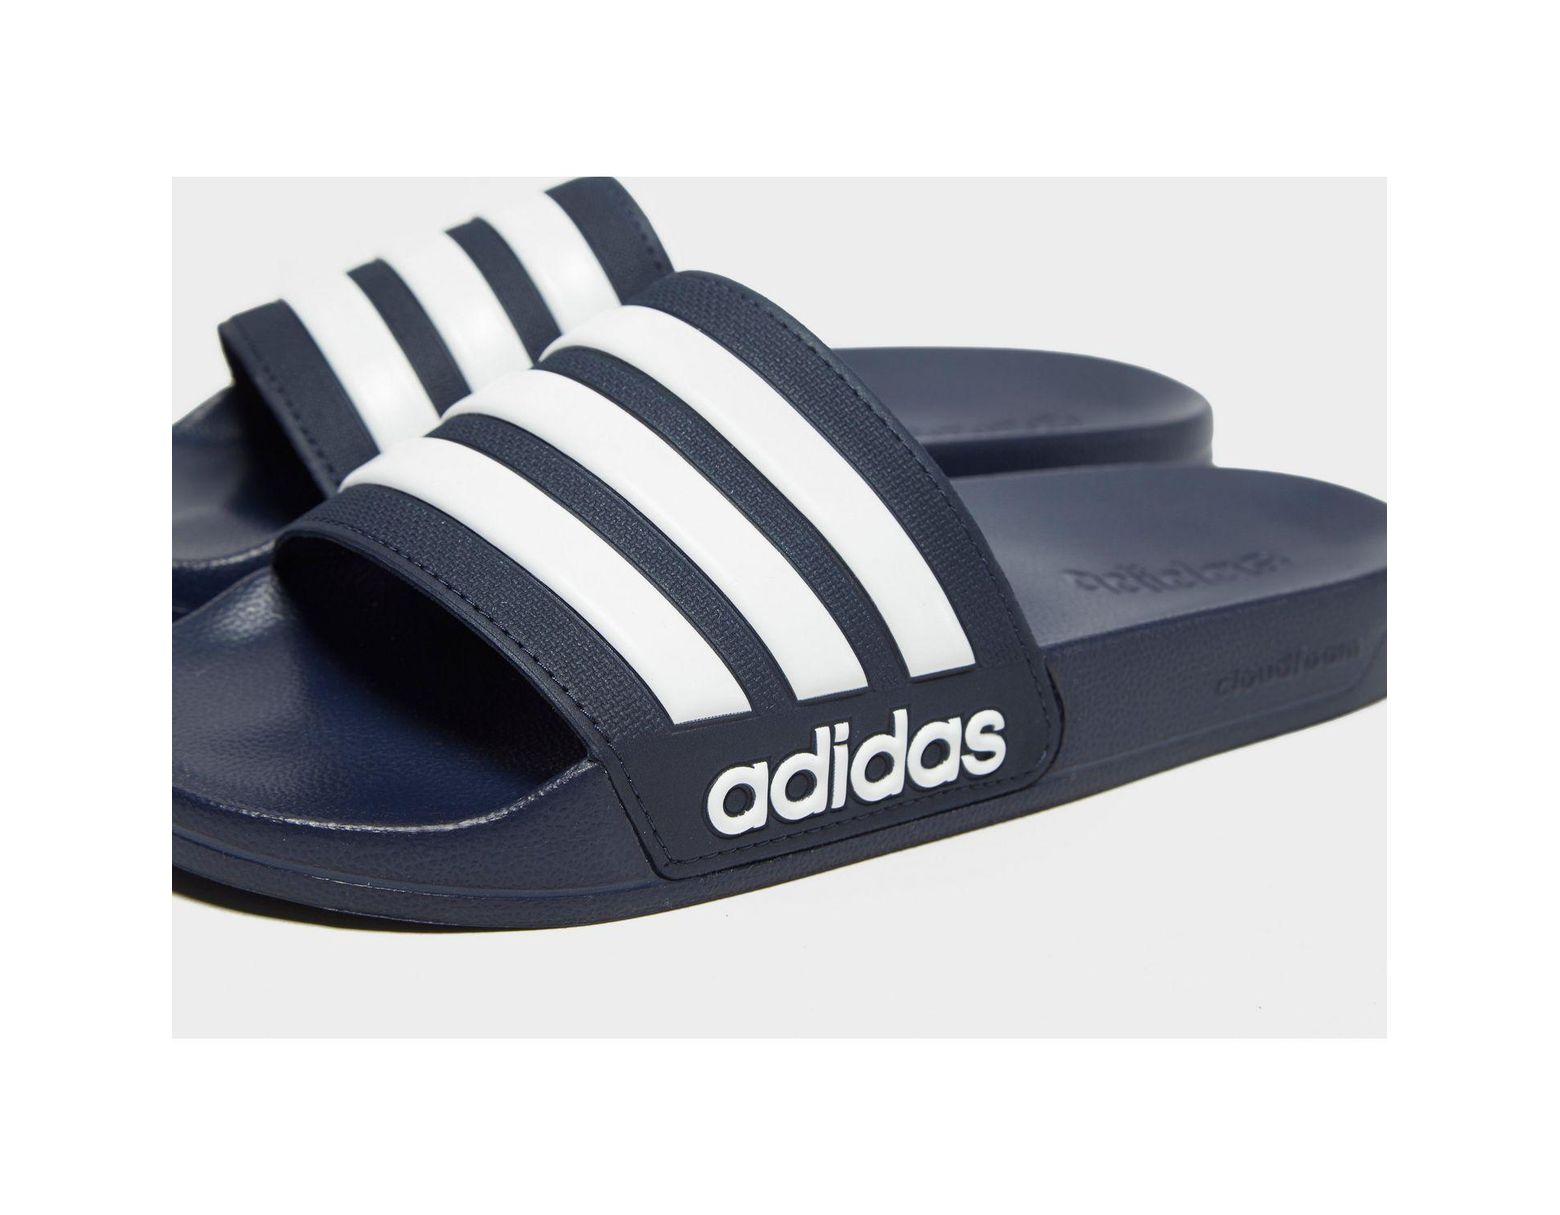 wholesale dealer 7f772 7ff48 Lyst - adidas Cloudfoam Adilette Slides in Blue for Men